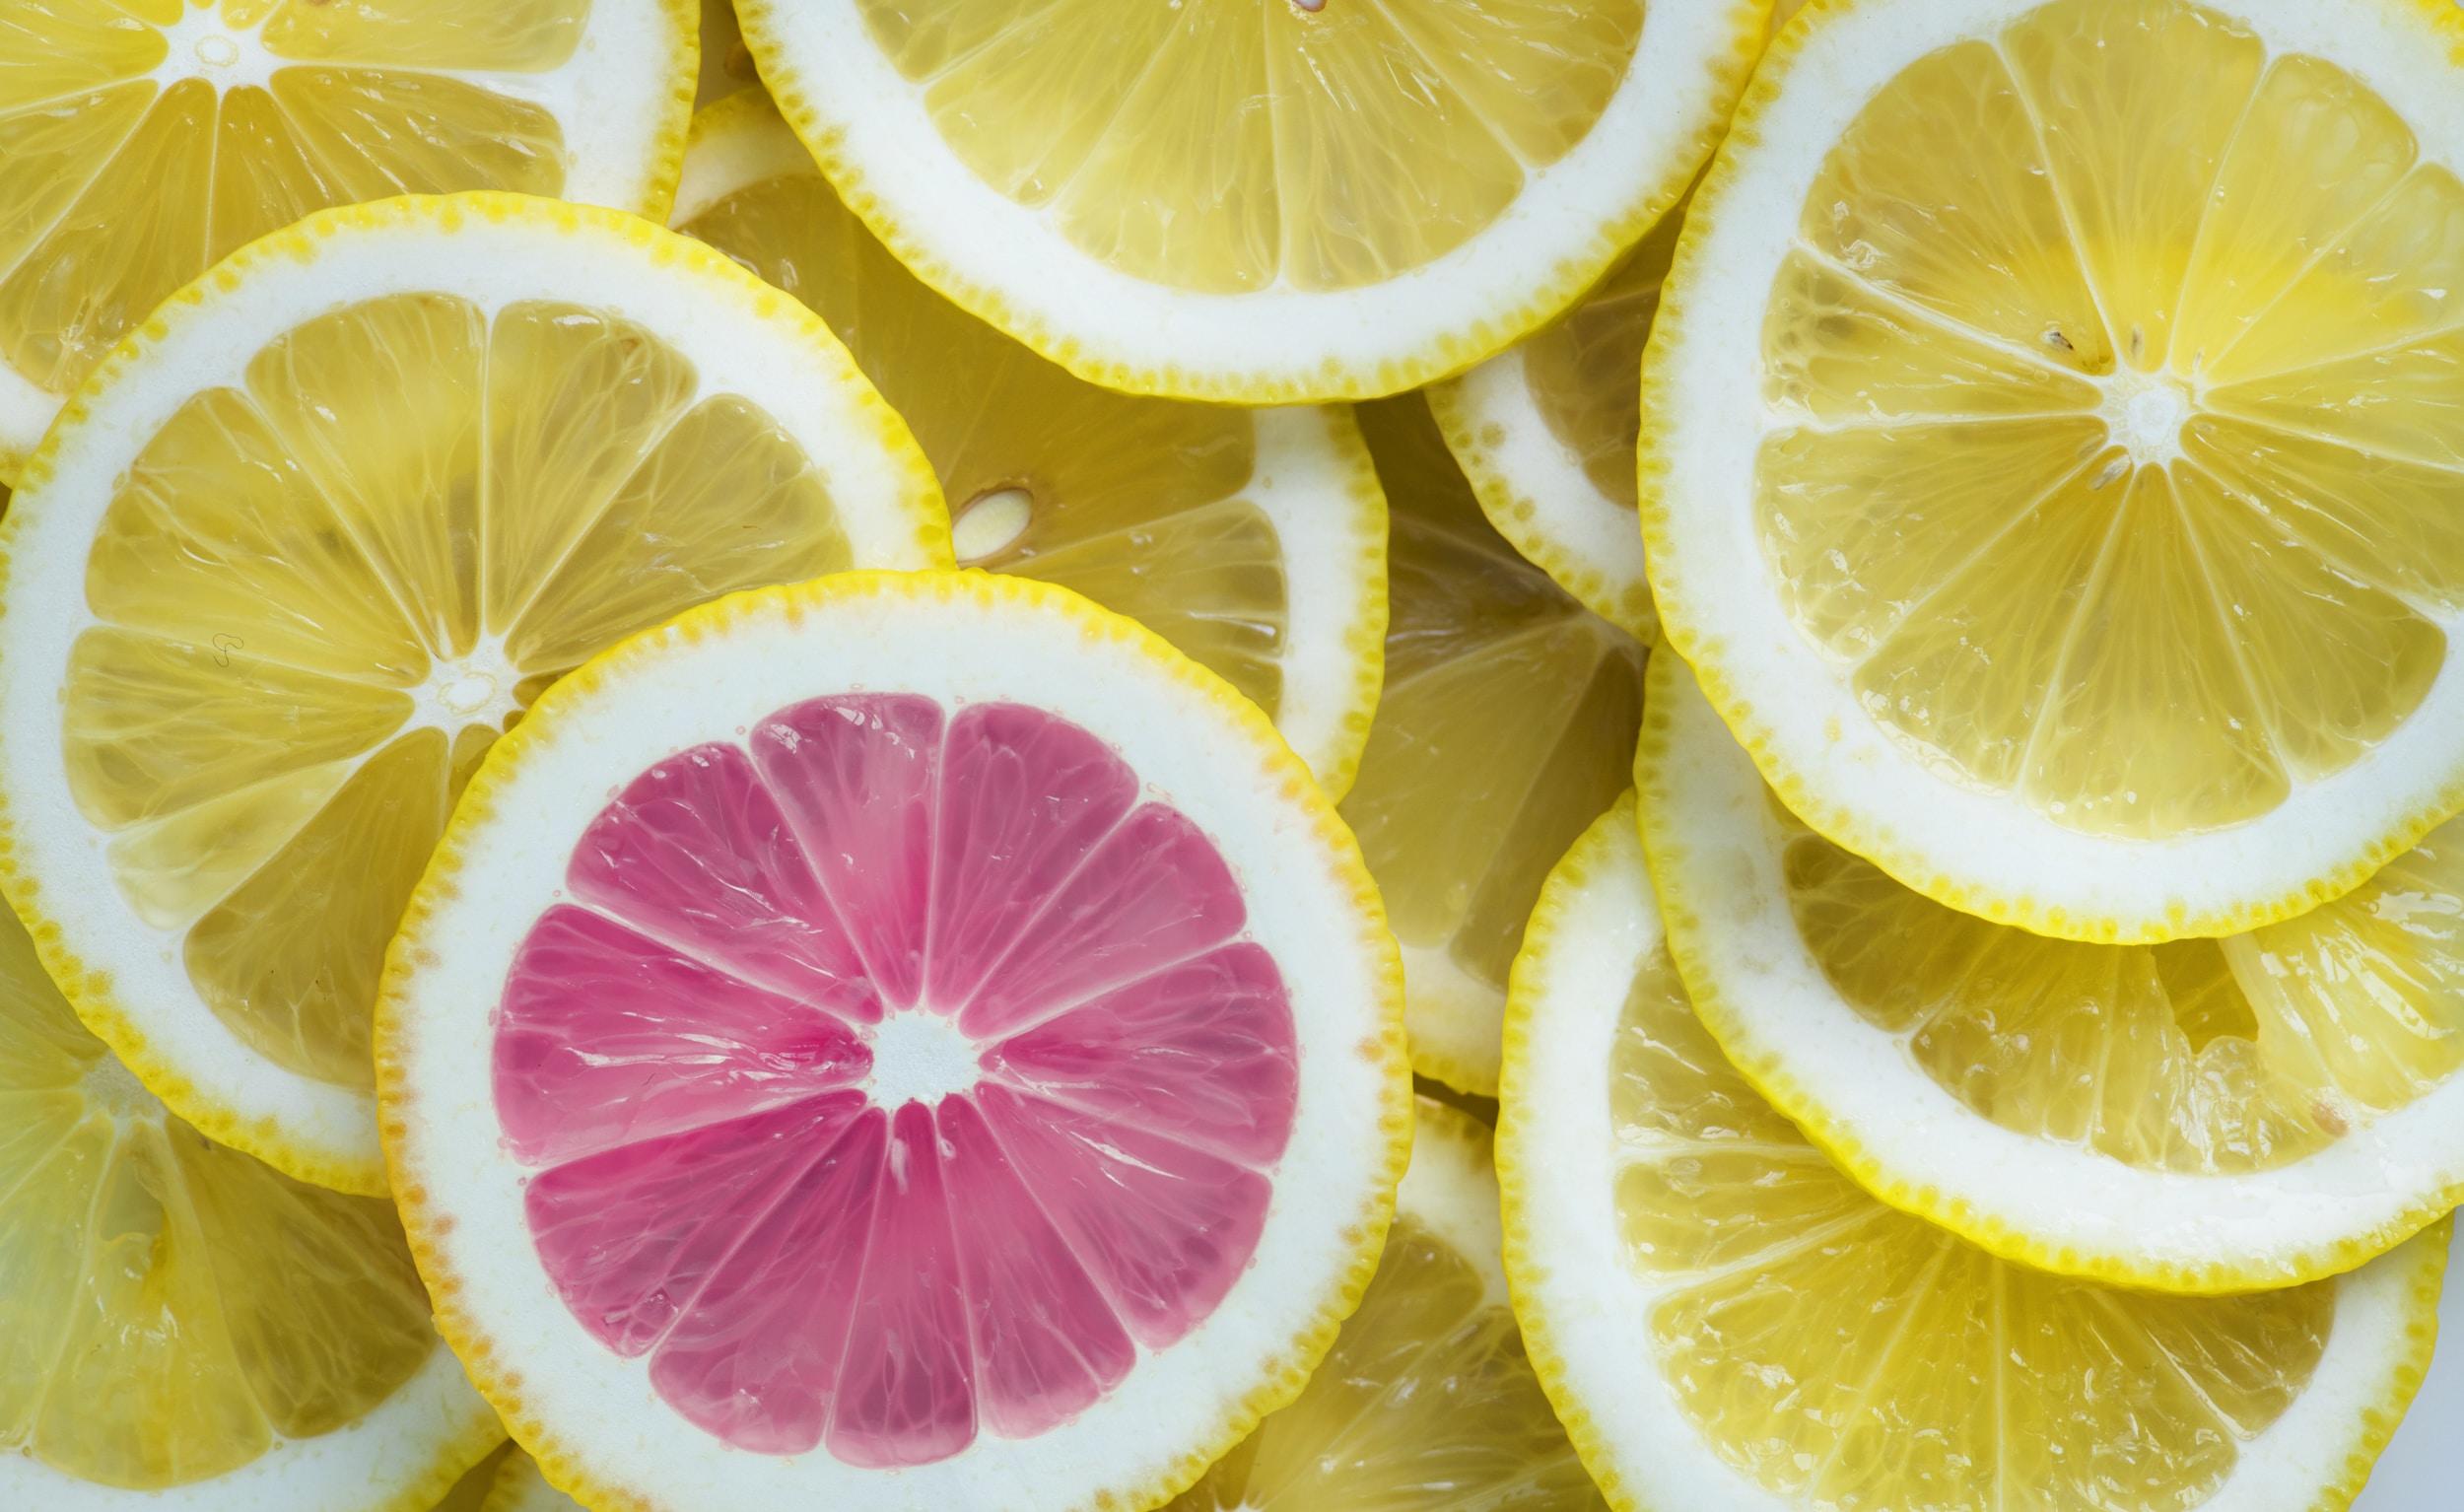 Lemons life stories